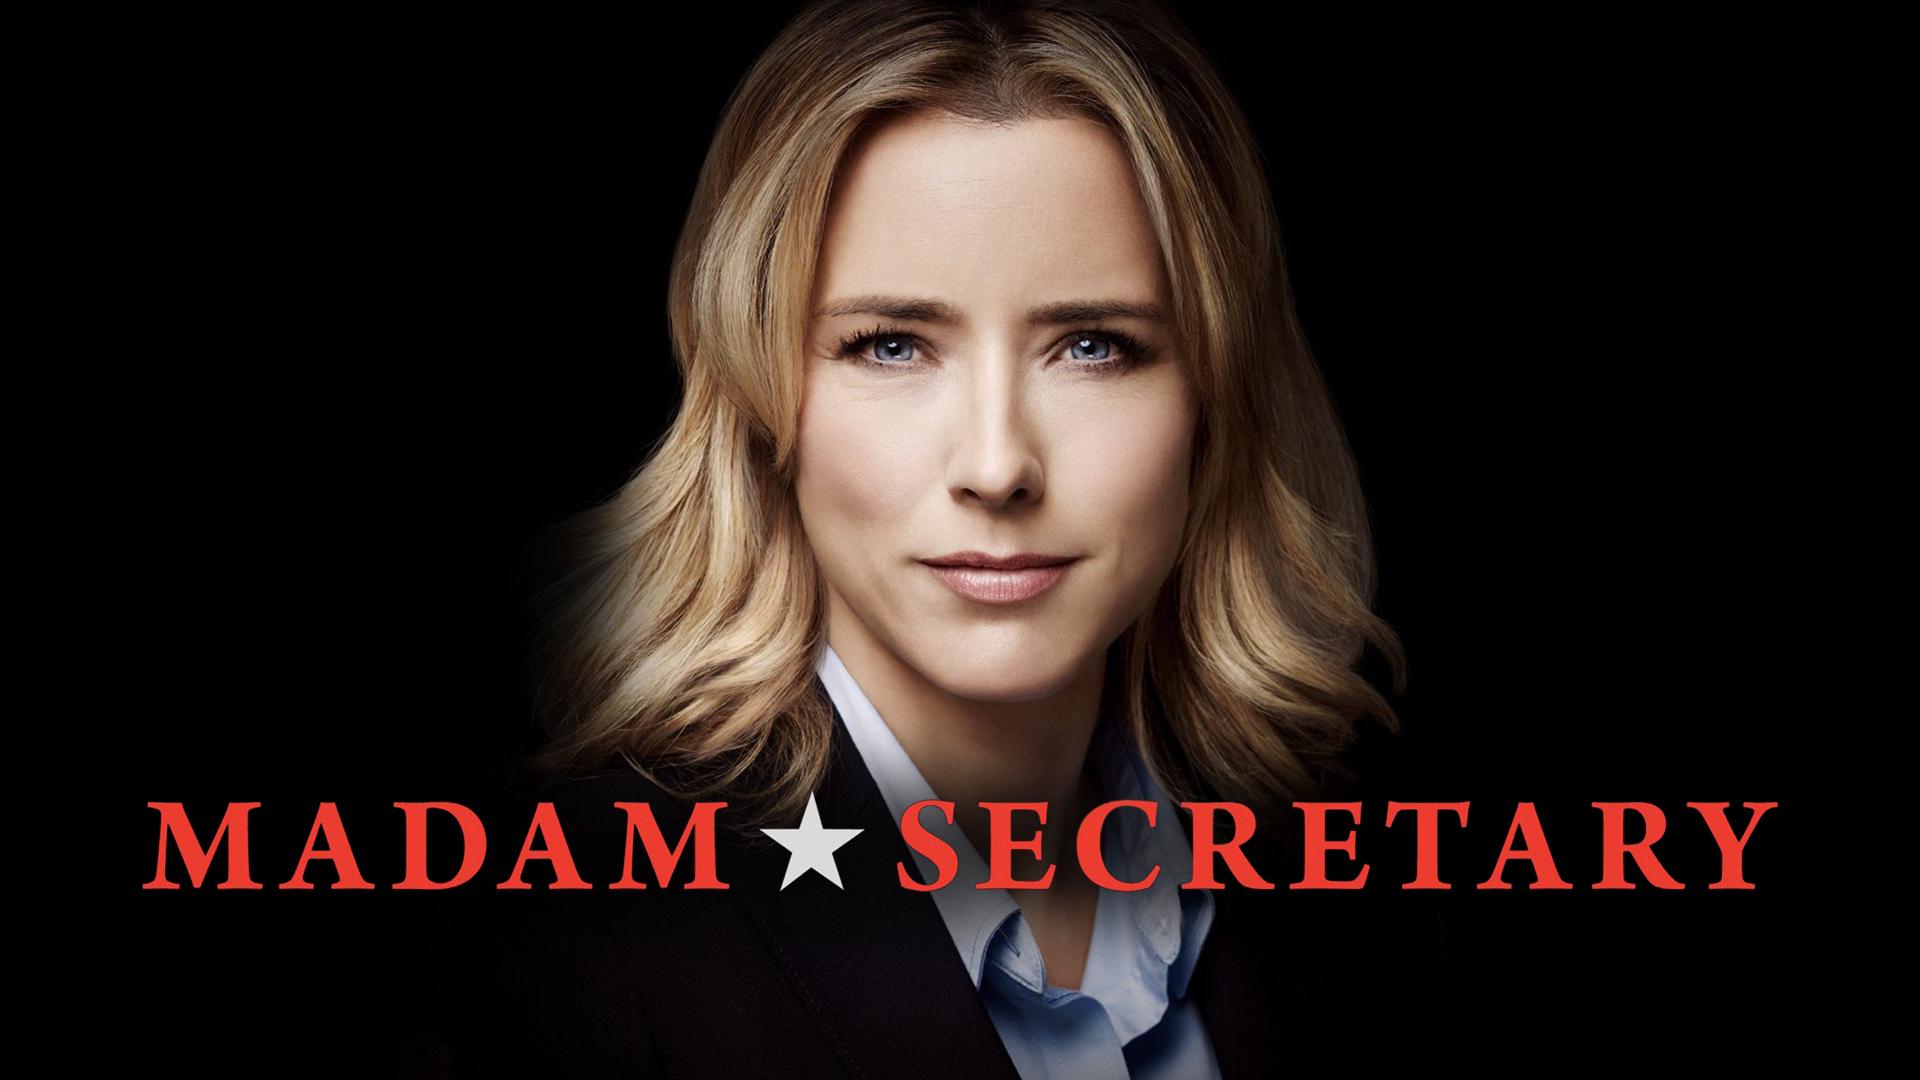 Madam Secretary, Season 1